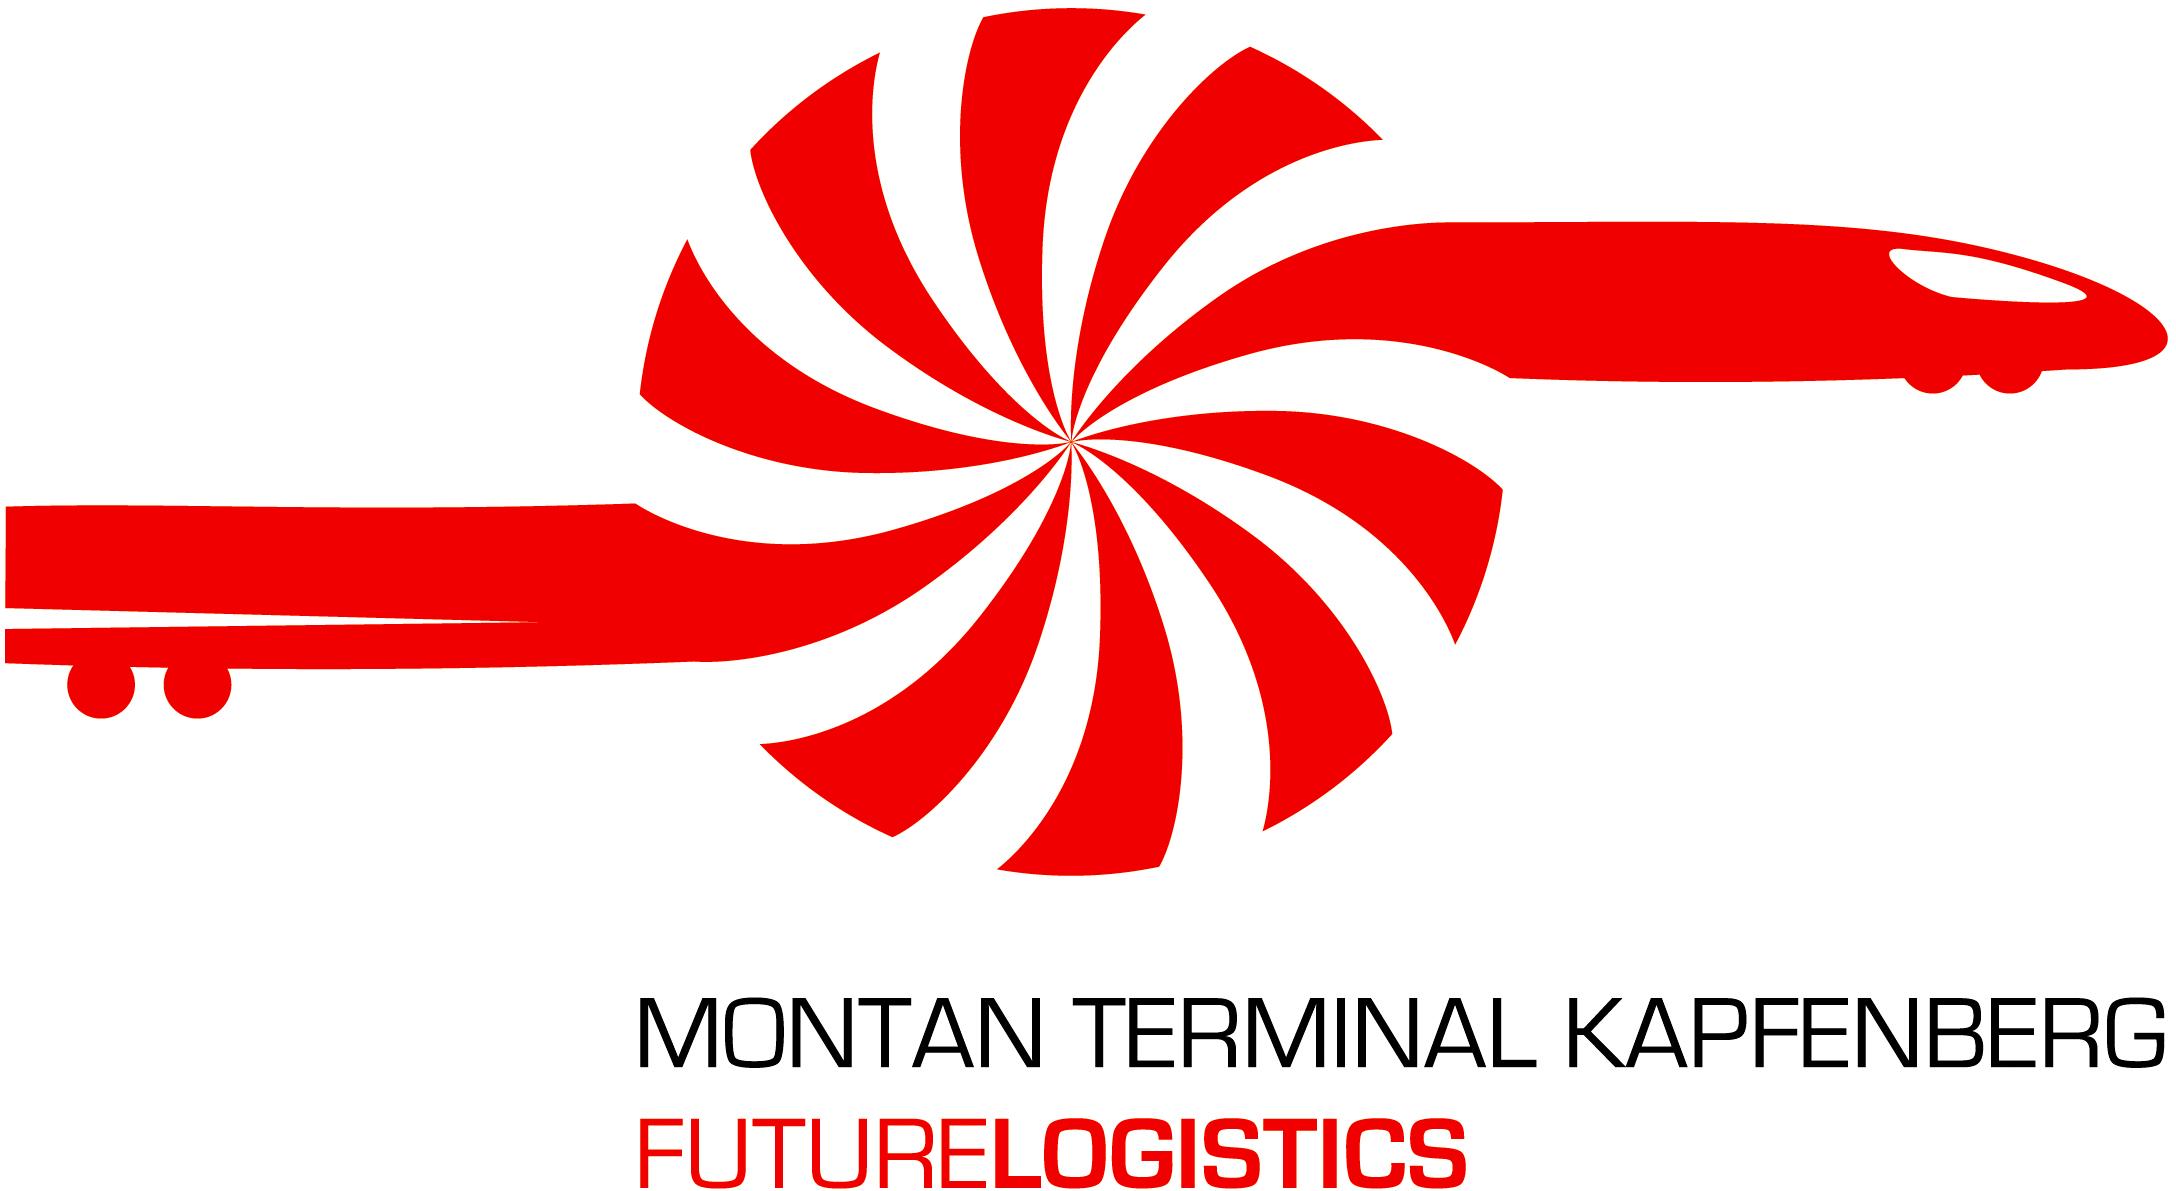 Montan Terminal Kapfenberg GmbH